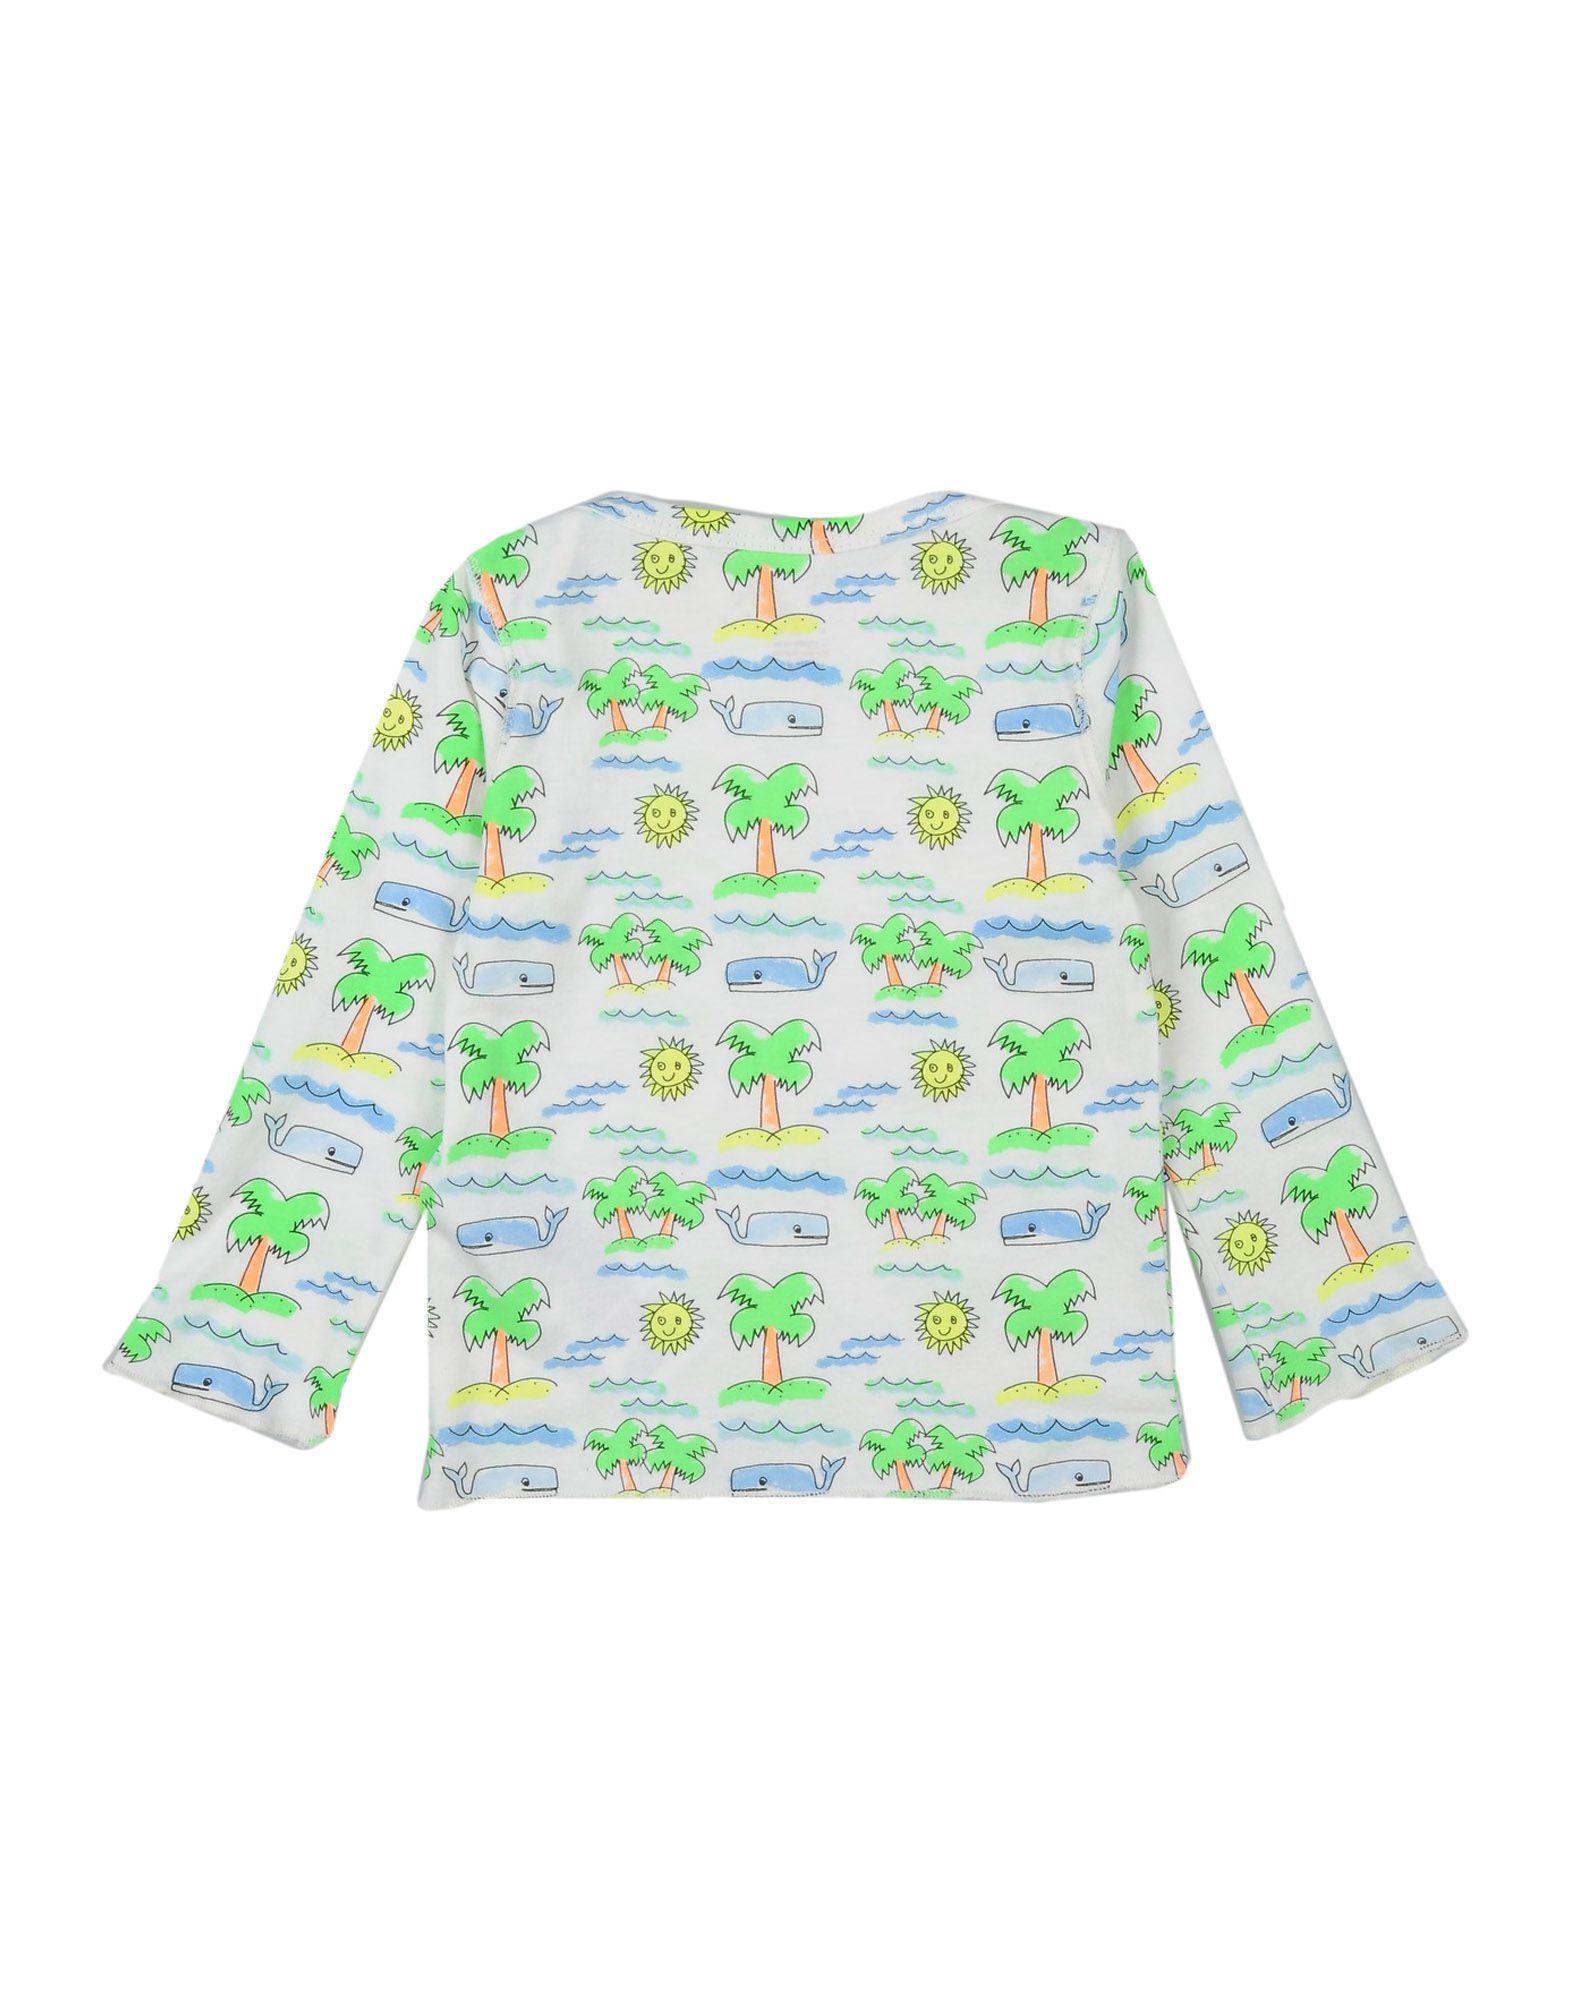 TOPWEAR Stella Mccartney Kids Ivory Unisex Cotton